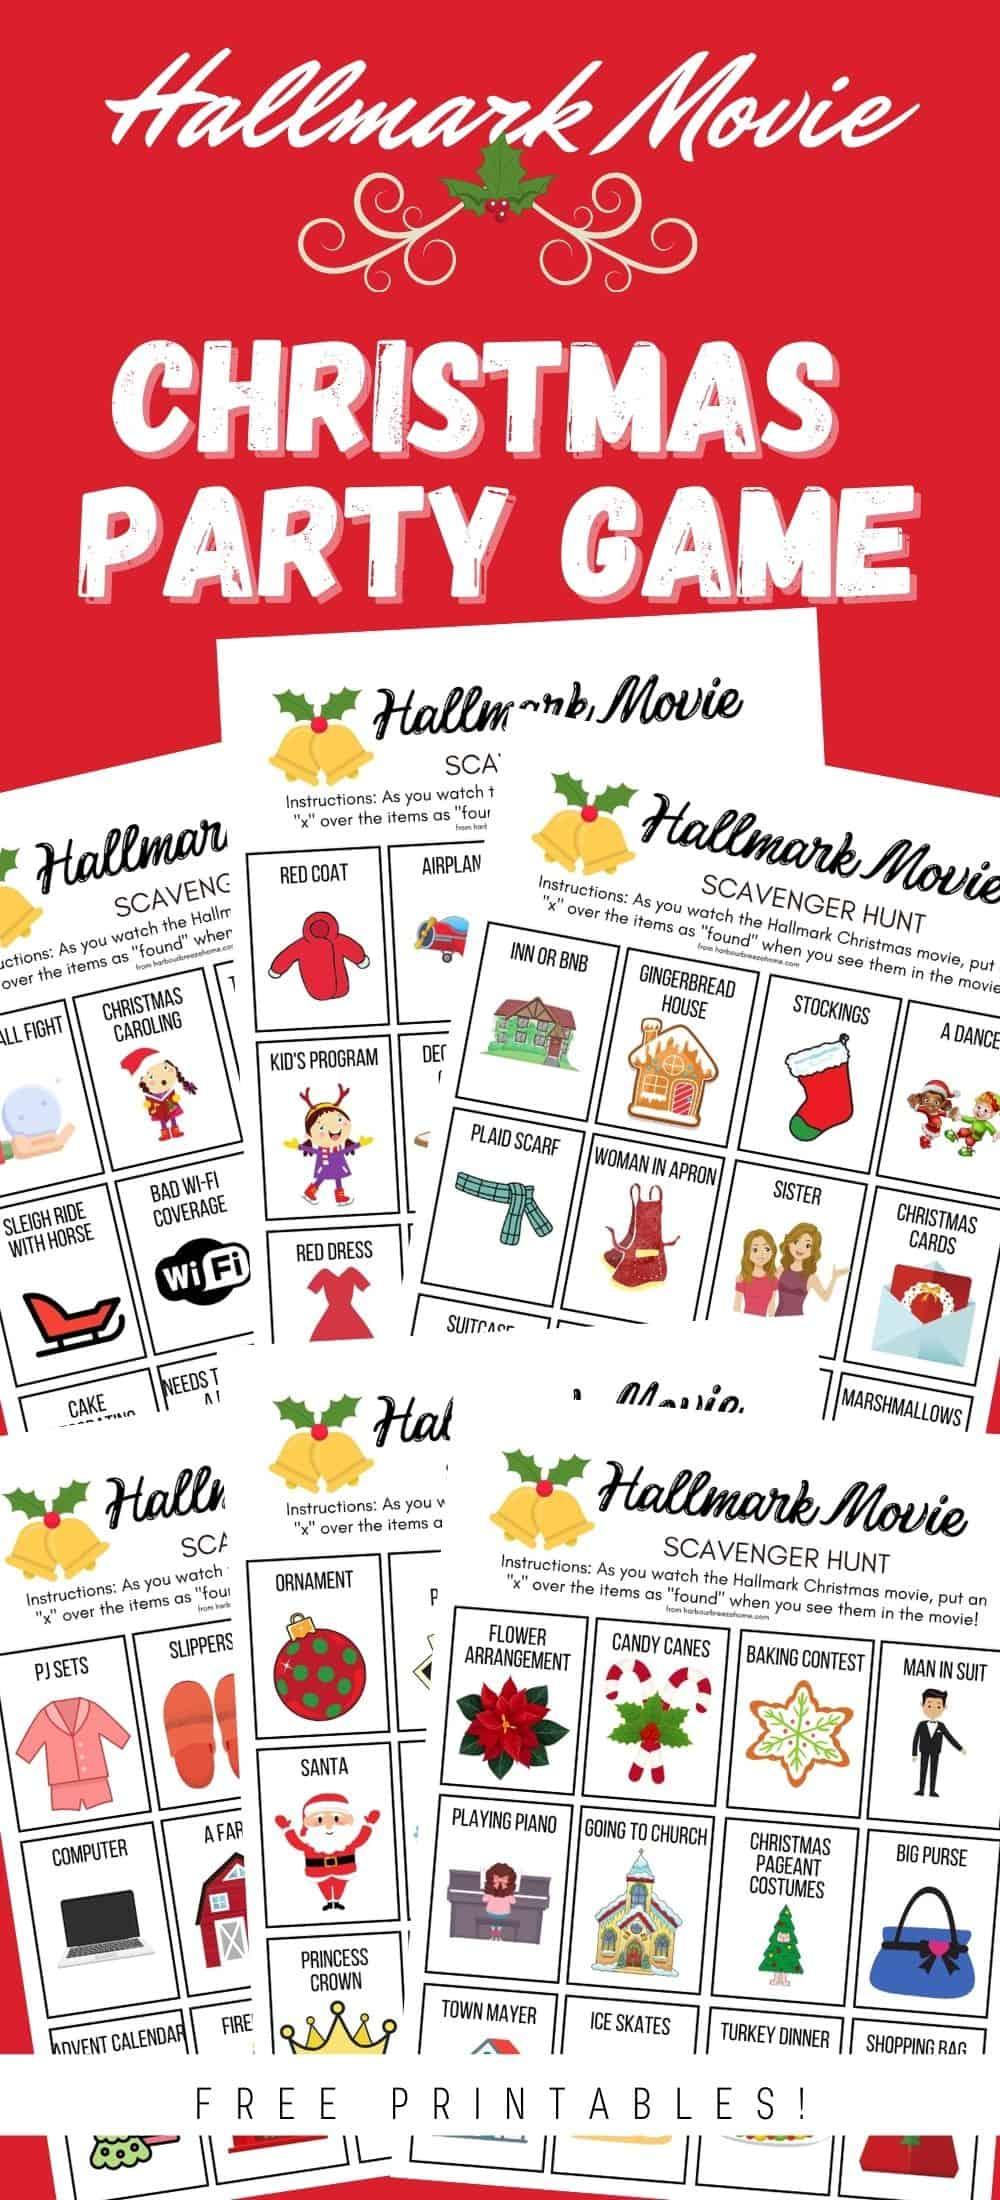 Christmas Party Games - Hallmark Christmas Movie Scavenger Hunt